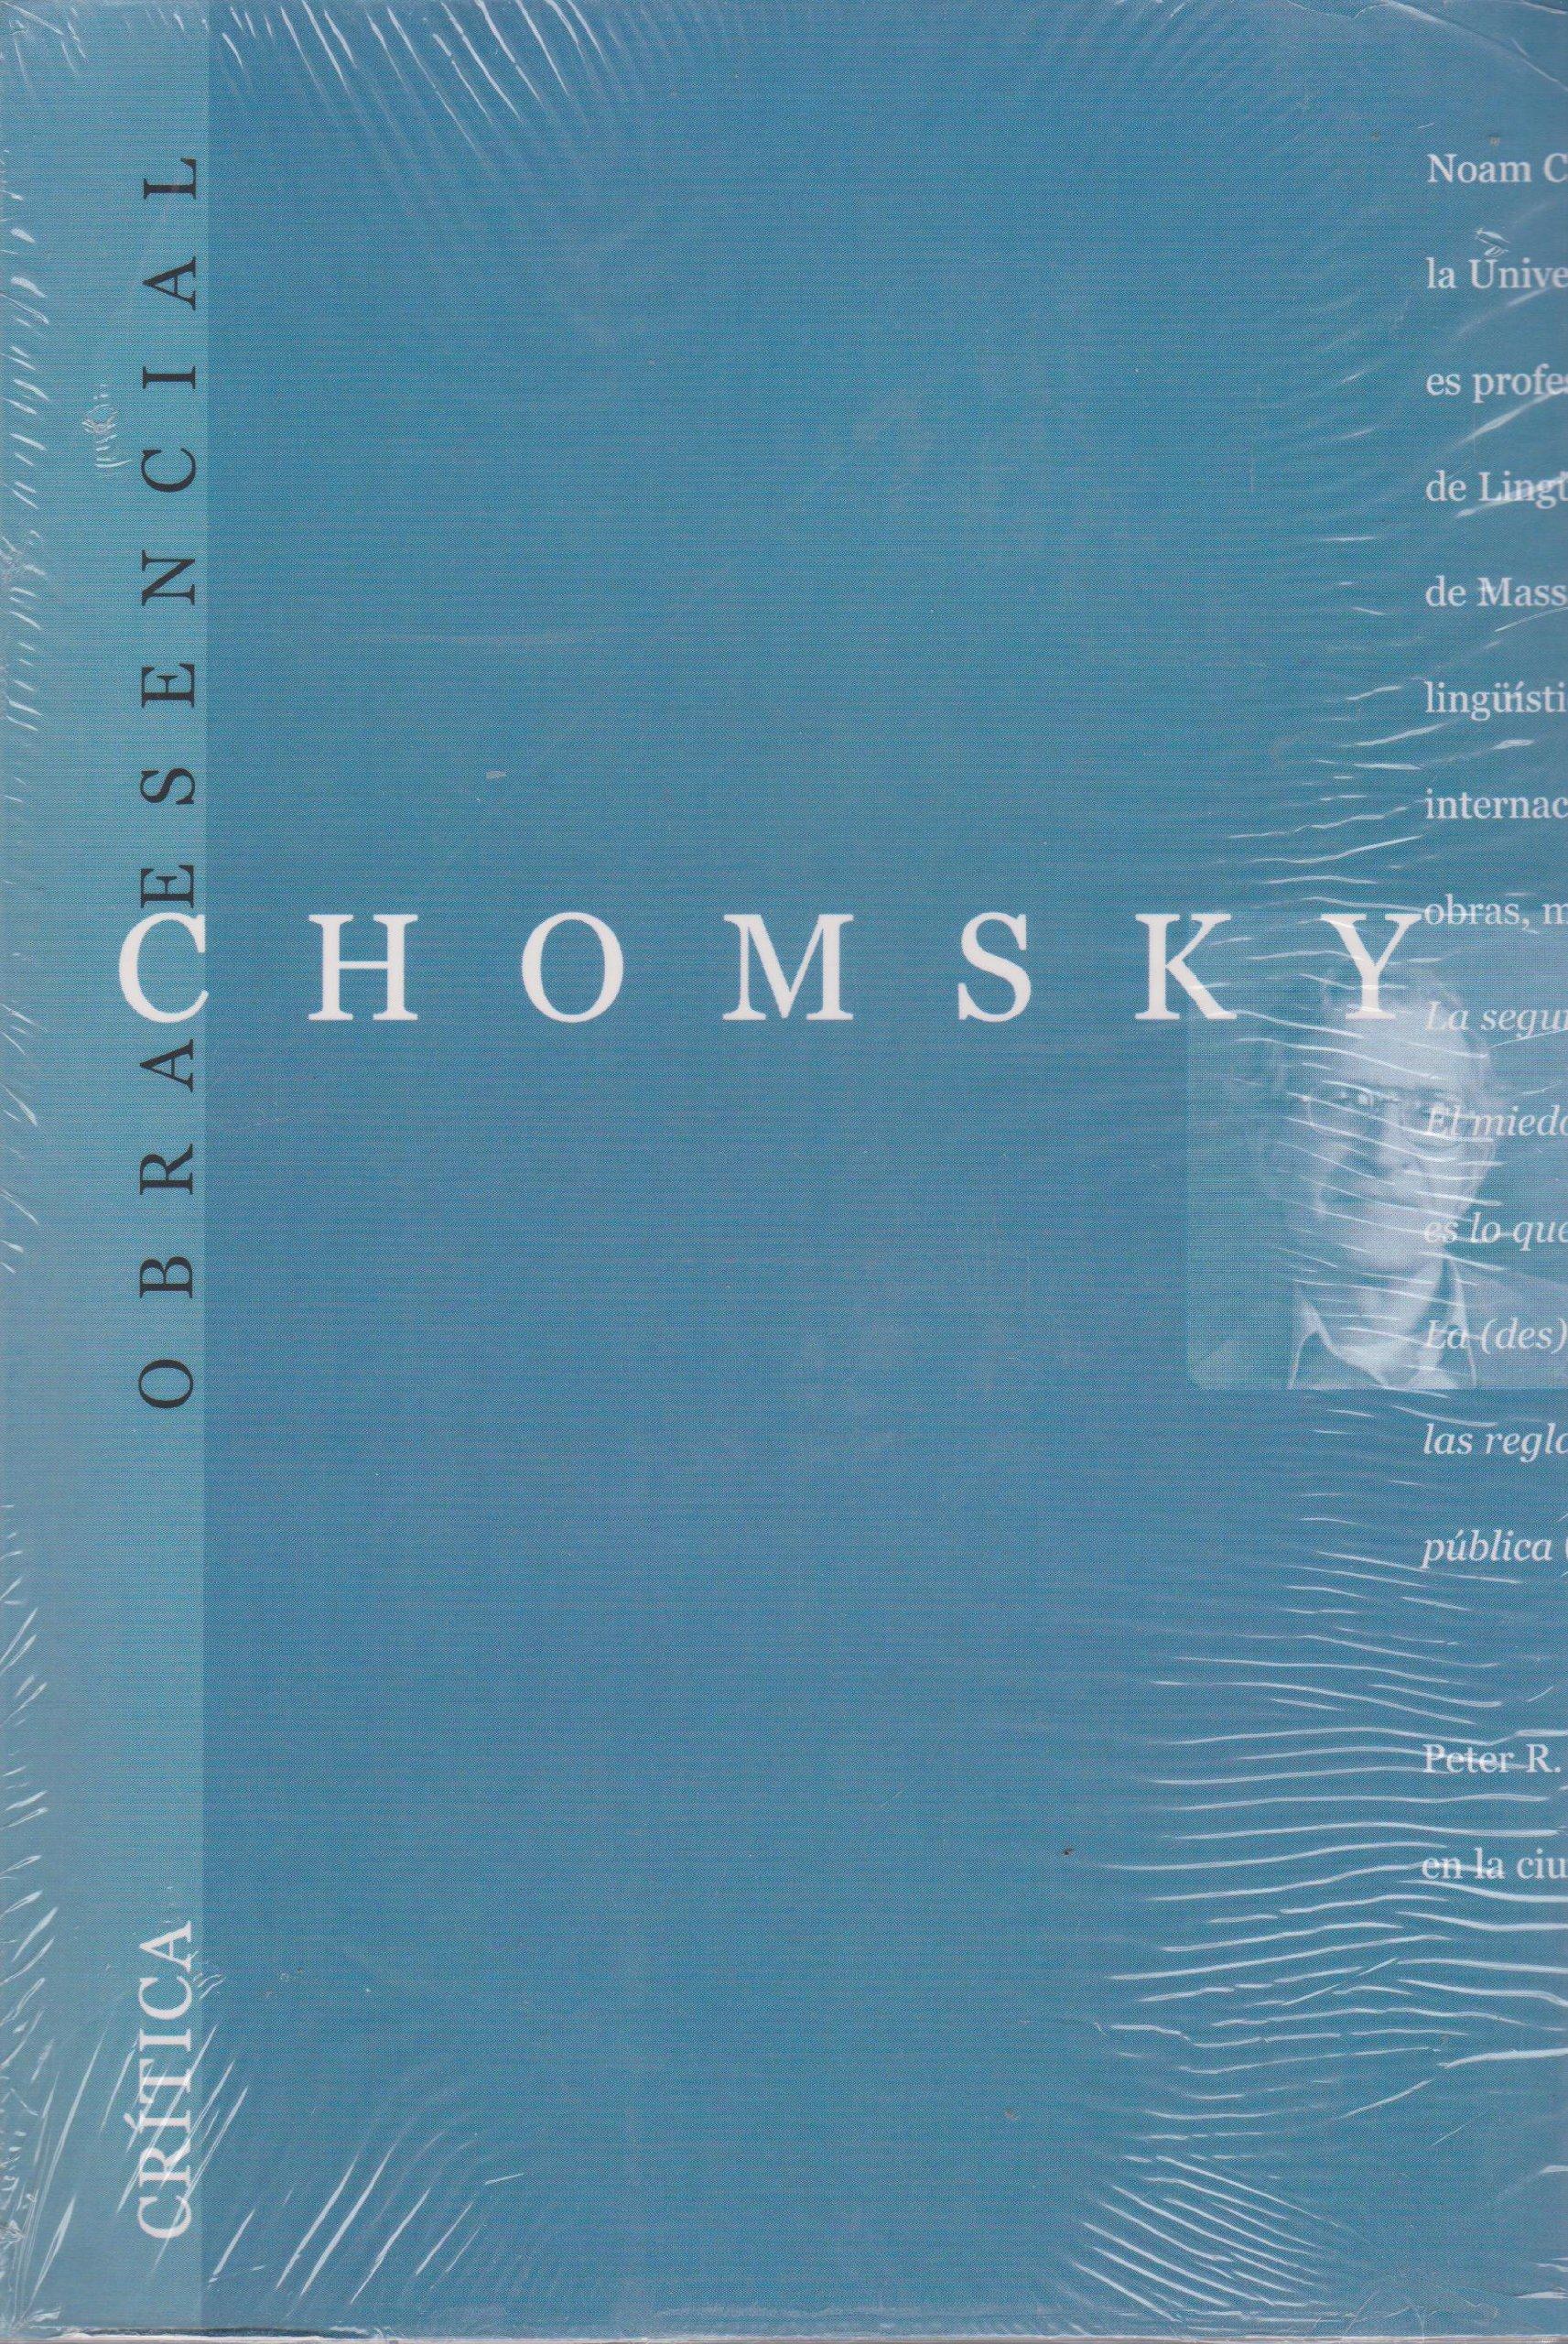 Chomsky esencial (Obra Esencial): Amazon.es: Chomsky, Noam, Mitchell, Peter, Schoeffel, John: Libros